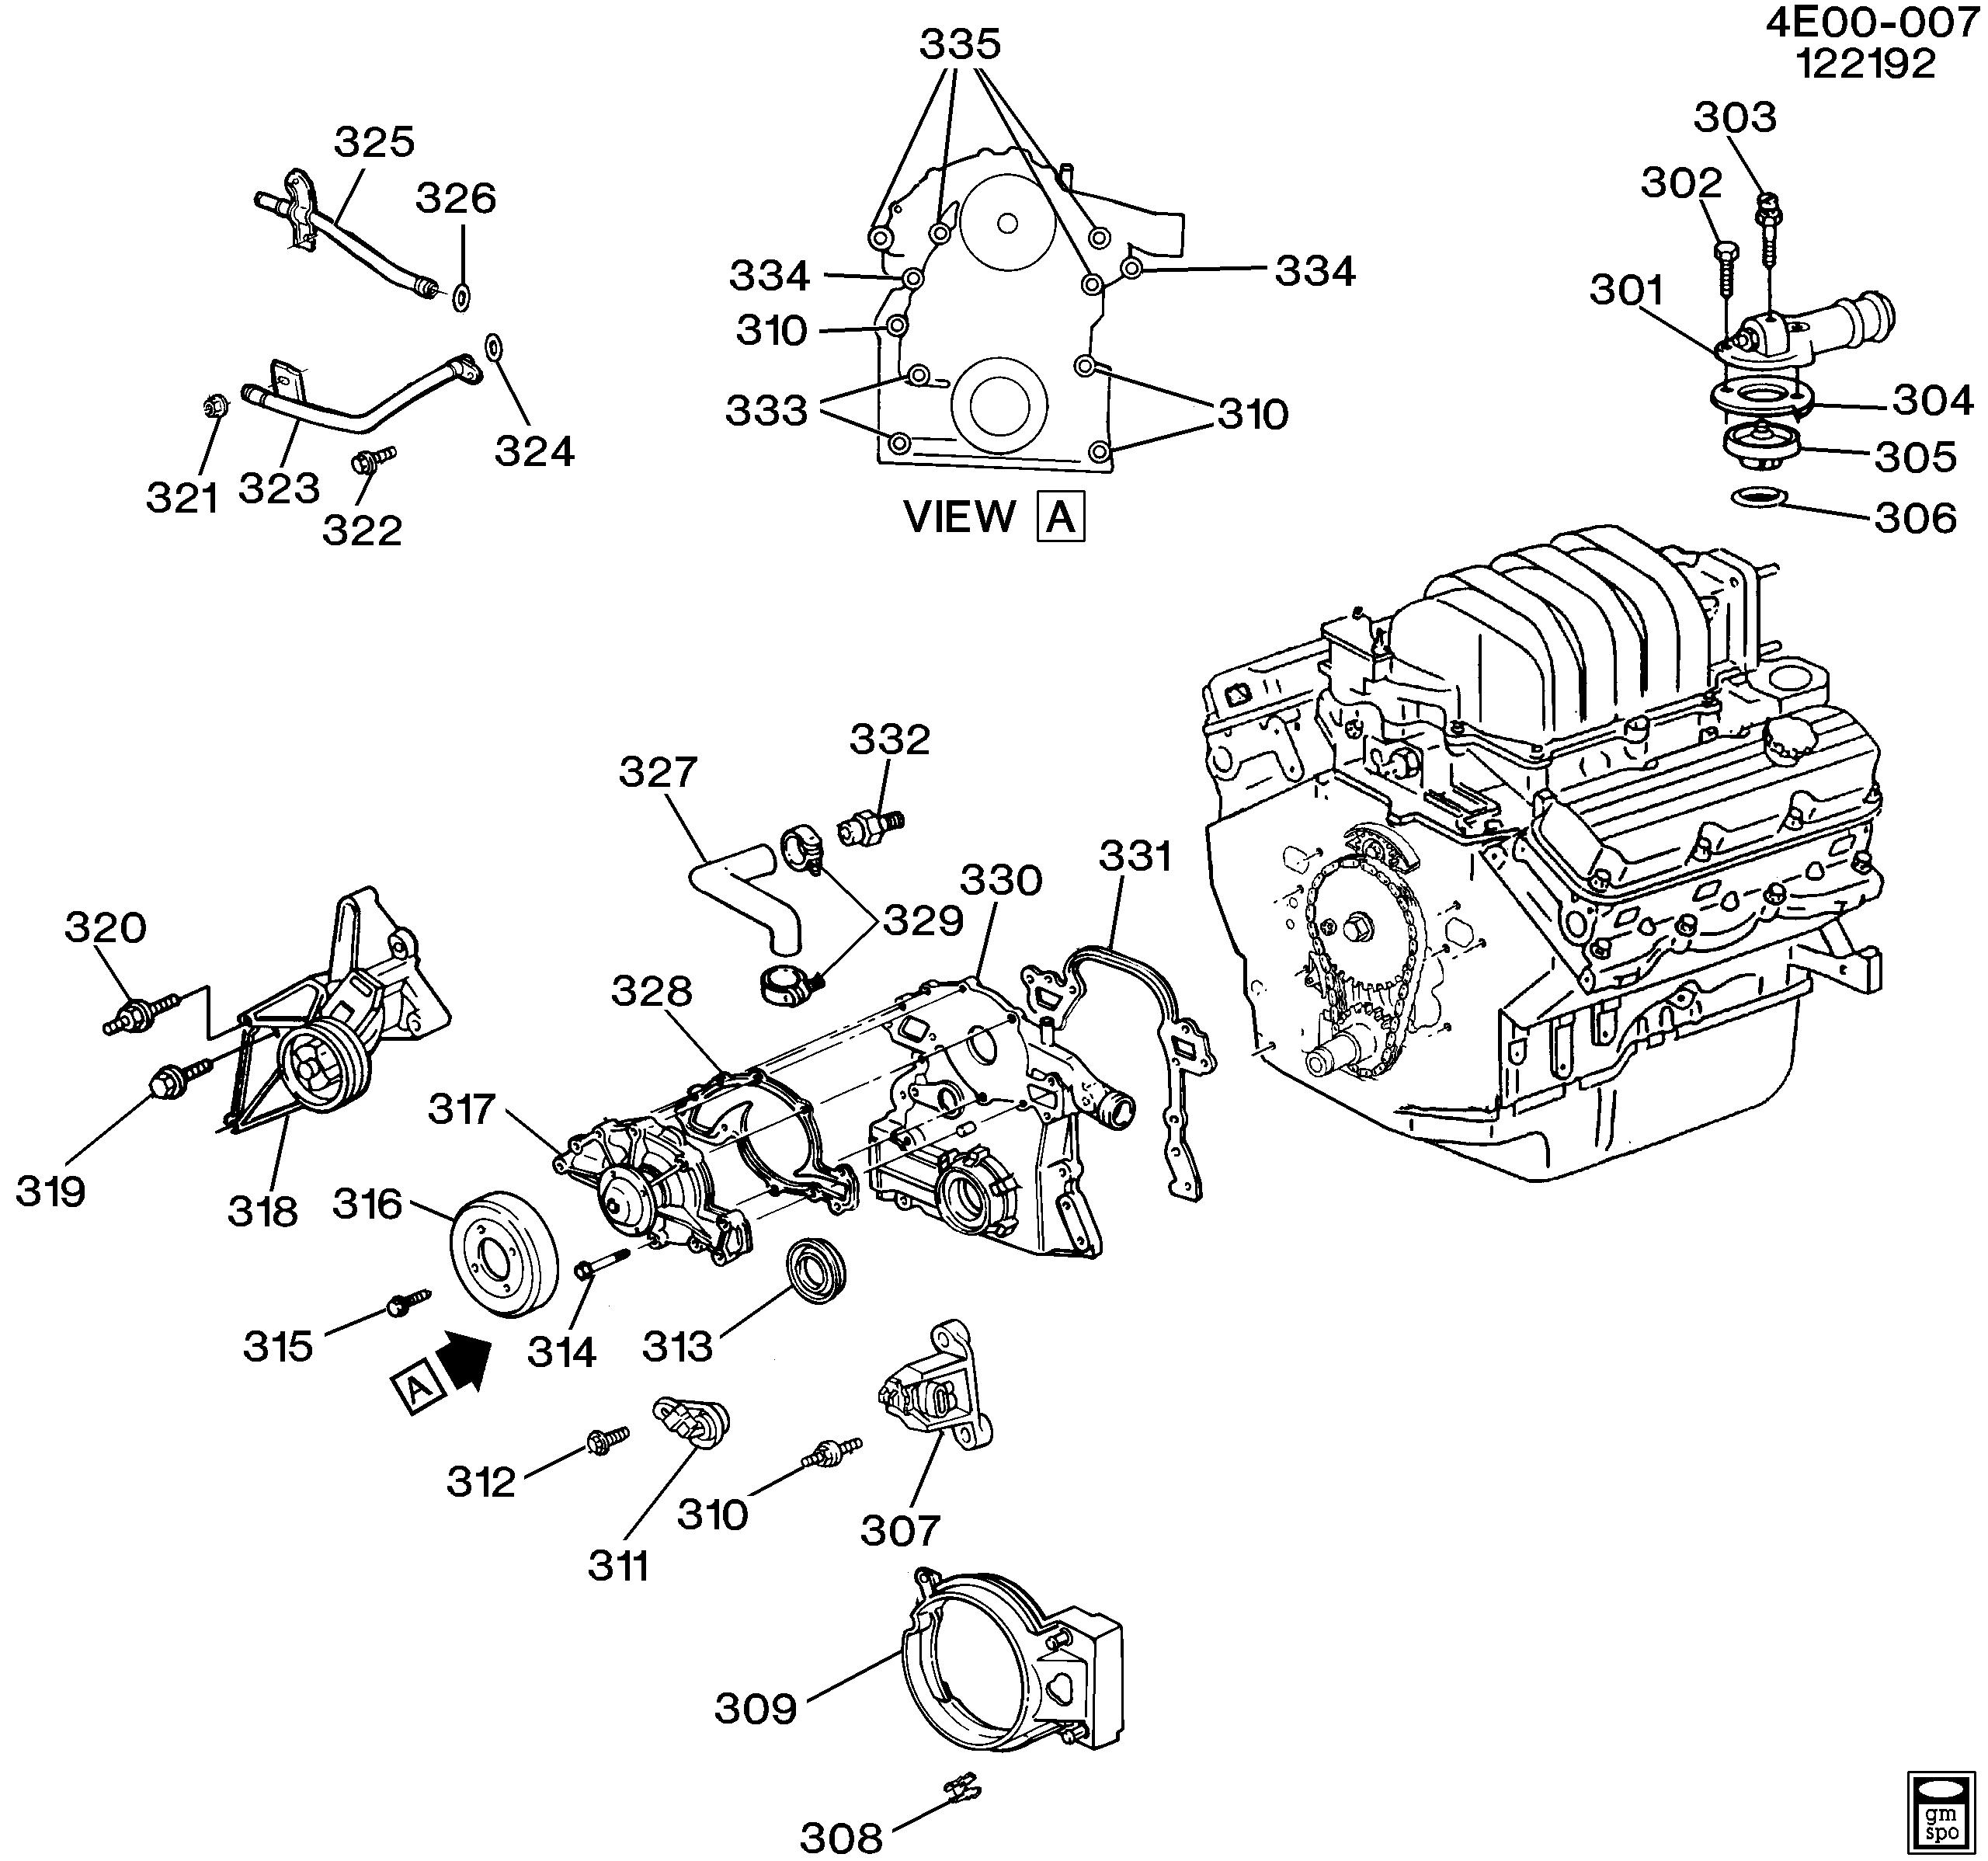 [DIAGRAM_3ER]  Buick Reatta - E ENGINE ASM-3.8L V6 PART 3 FRONT COVER AND COOLING  (L27/3.8L) > EPC Online > Nemiga.com | Gm 308 Engine Diagram |  | Parts catalogs